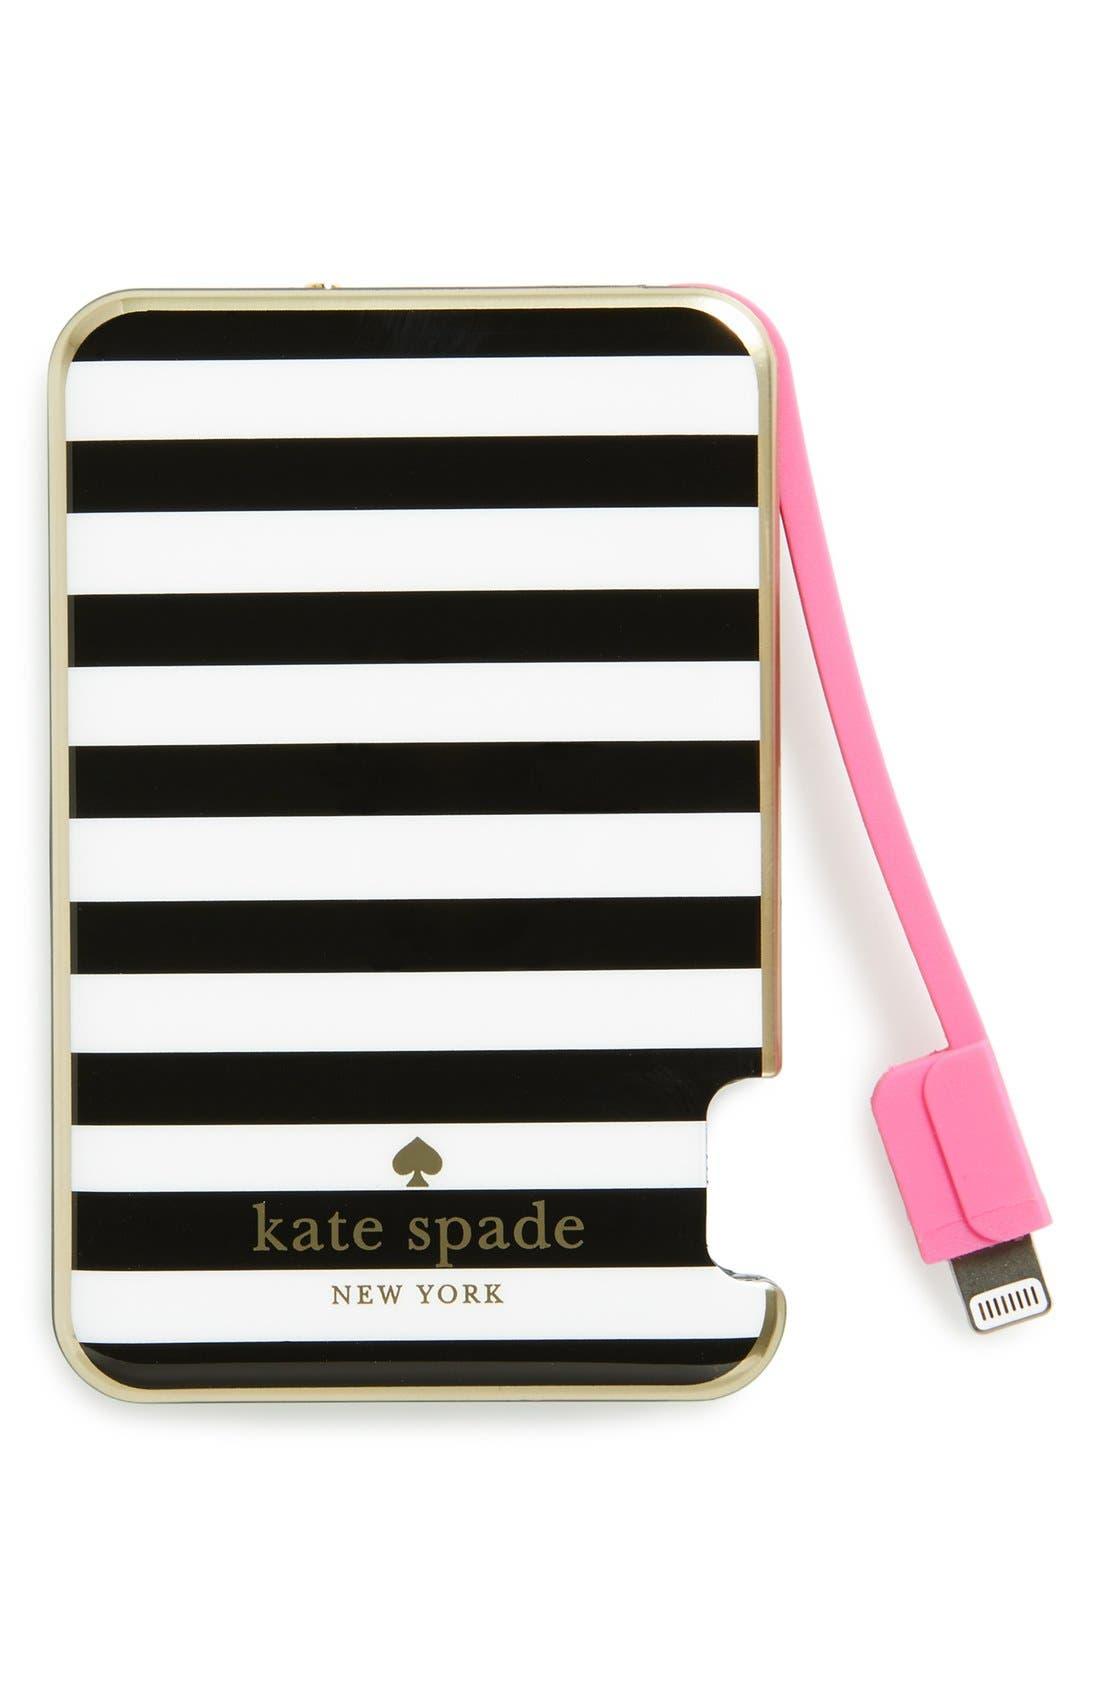 KATE SPADE NEW YORK katespade new yorkslim portable charger, Main, color, 001